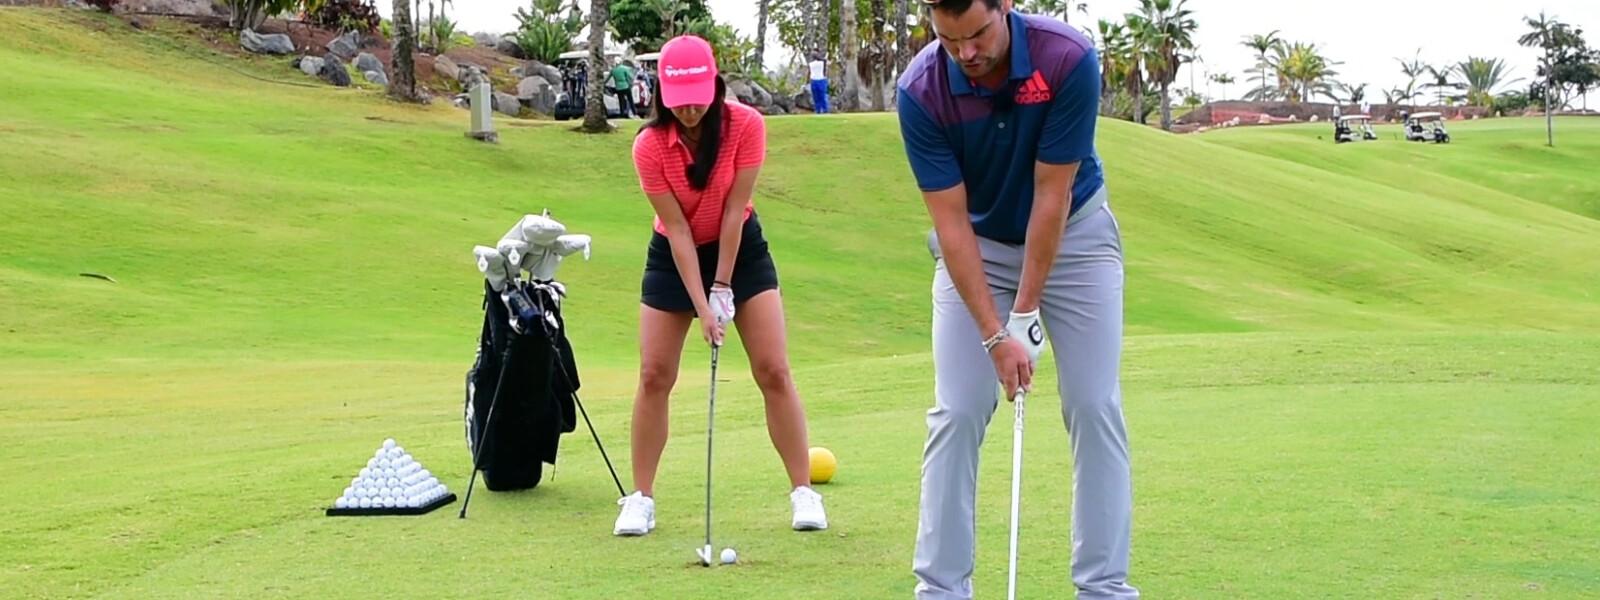 1. Golf-Trainingsvideo Treffmoment